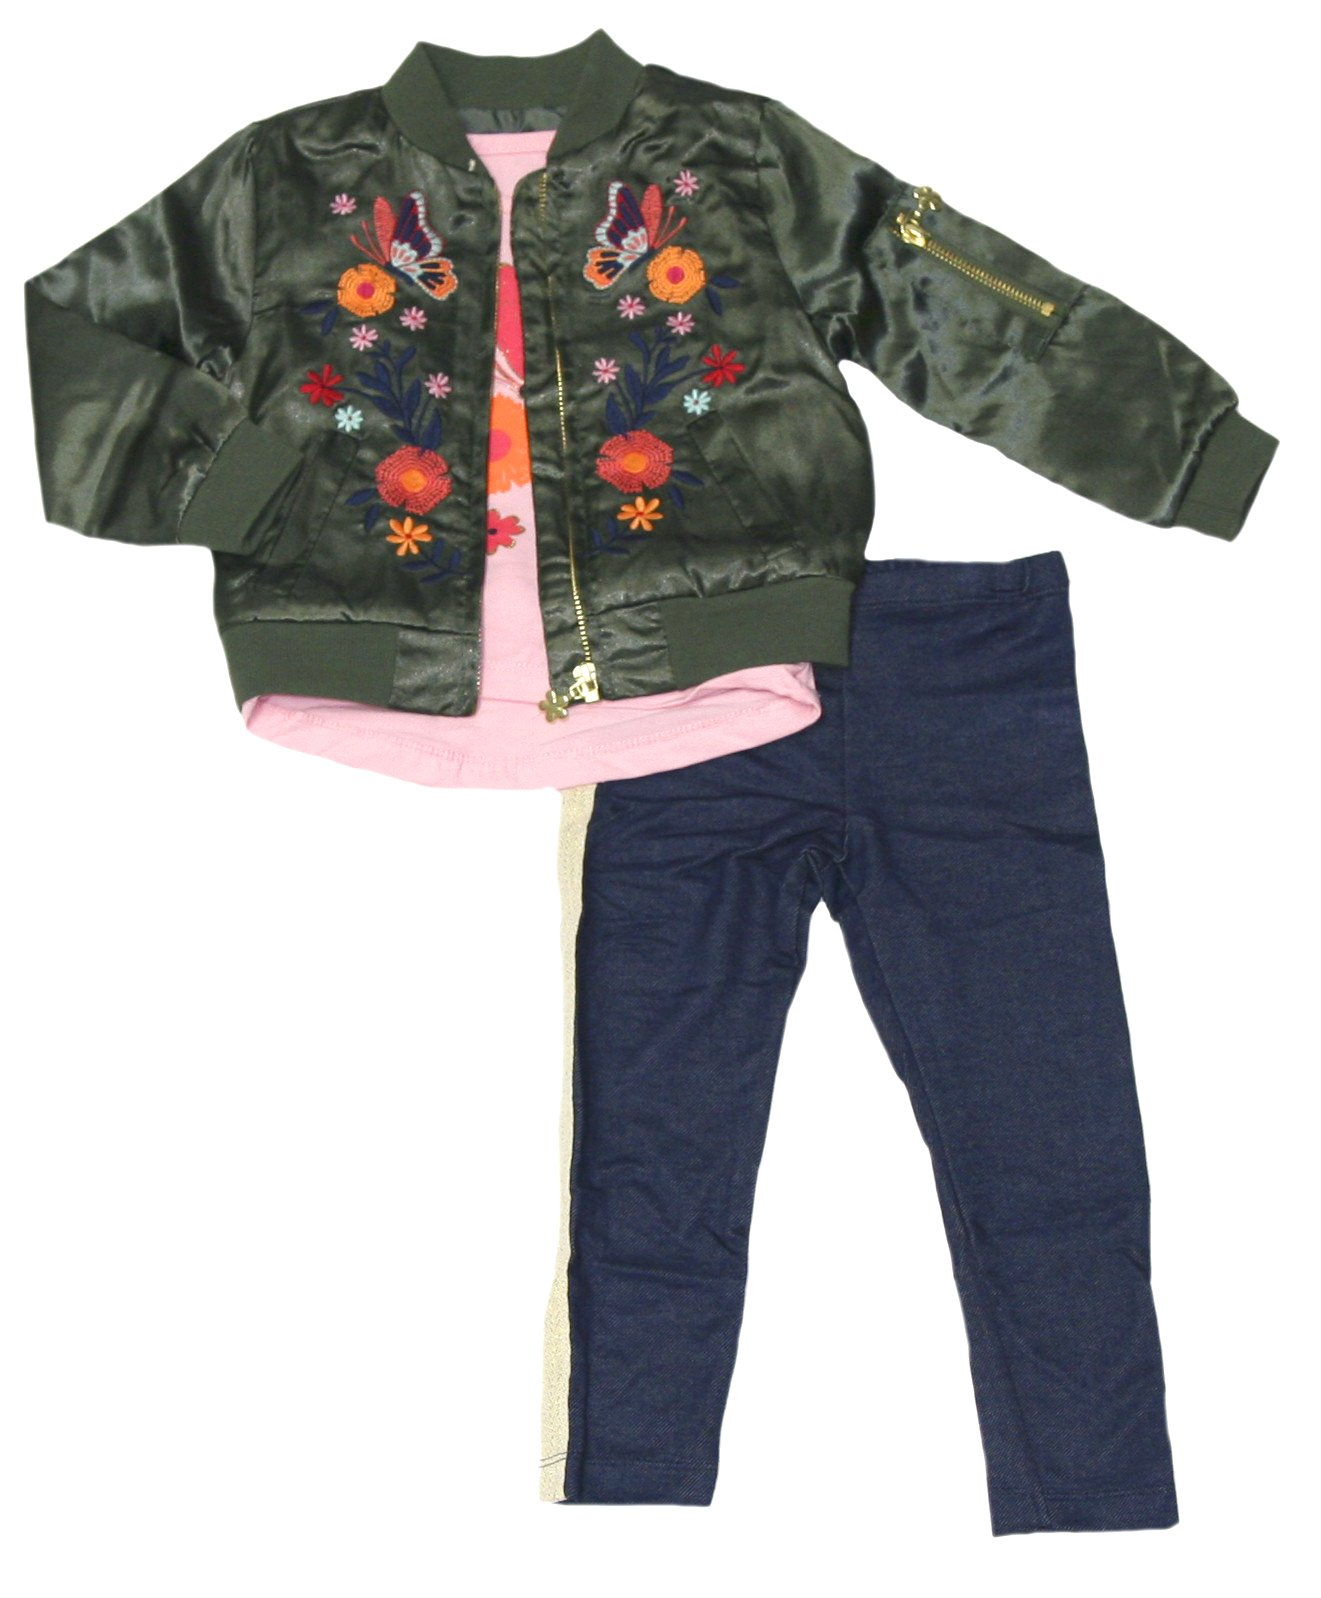 Flapdoodles Little Girls 3 Piece Clothing Set - Embroidered Bomber Jacket, Short Sleeve Shirt & Leggings (Green/Pink, 3T)